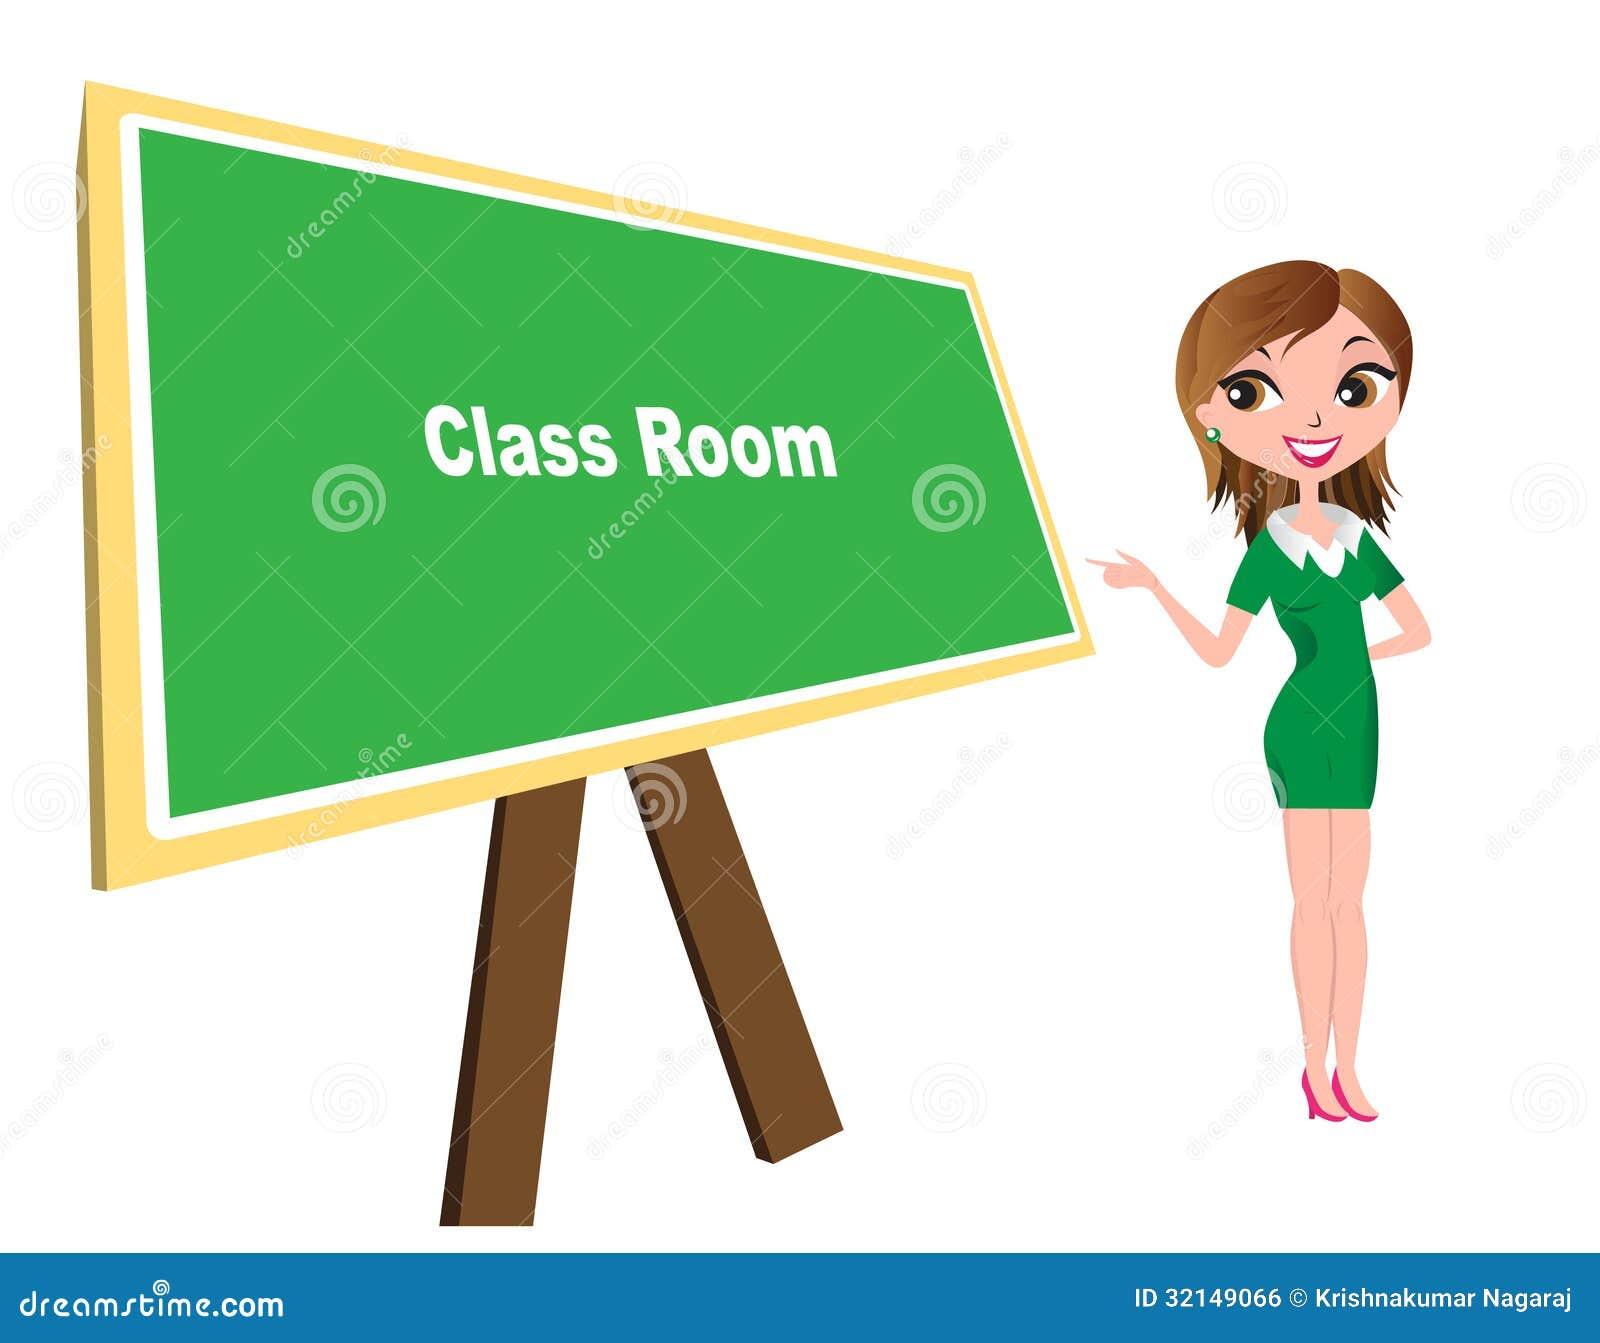 classification essay of teachers